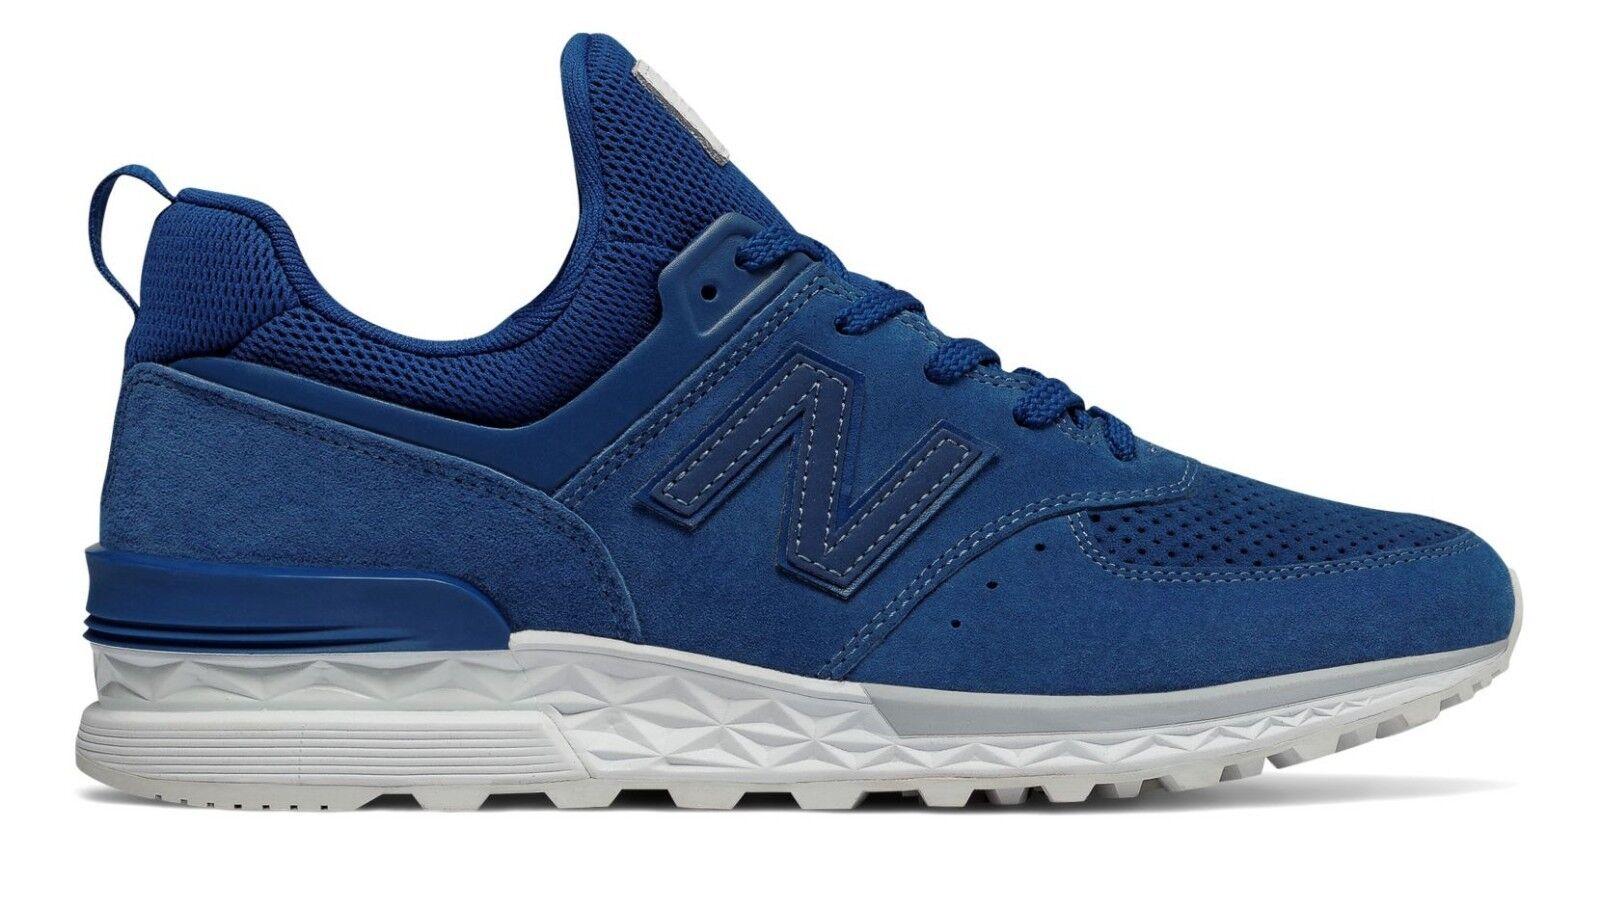 NIB New Balance MS574BLB 574 SPORT REMIXES blu blu blu SUEDE LIFESTYLE scarpe da ginnastica 8-12 005380